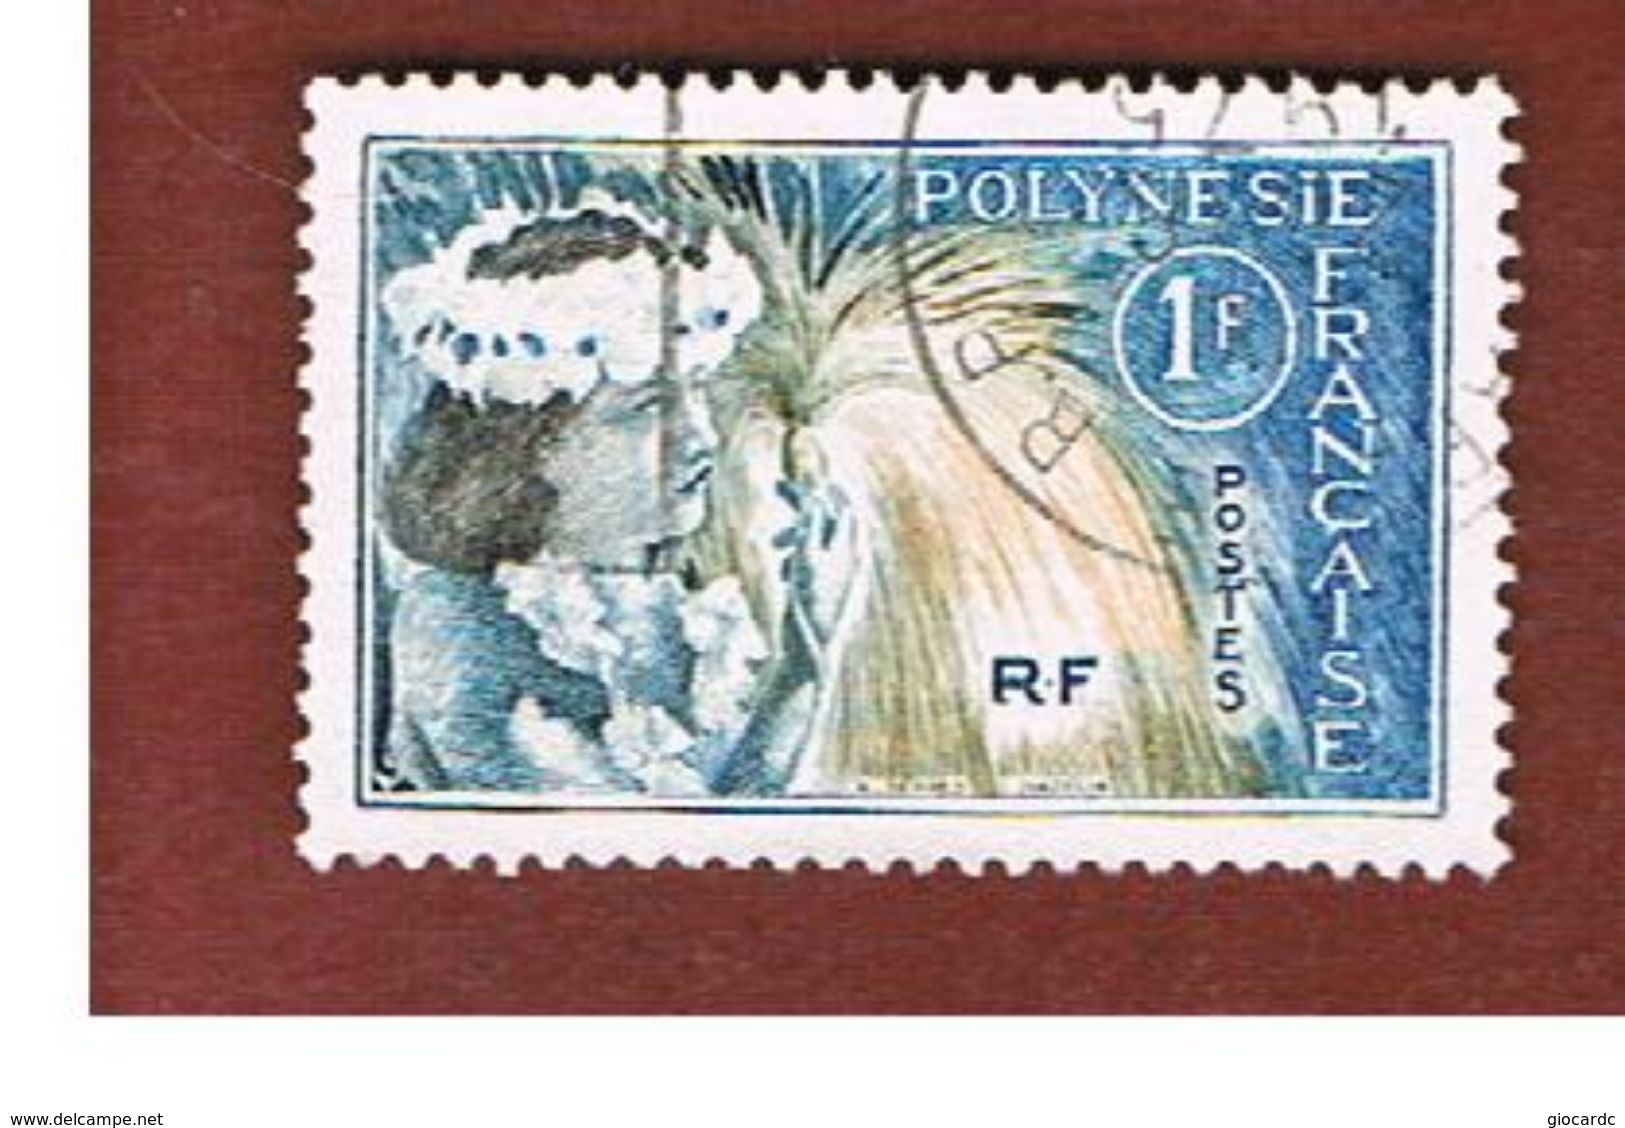 POLINESIA FRANCESE  (FRENCH POLYNESIA ) - SG 33  - 1964 TAHITIAN DANCER - USED° - Polinesia Francese